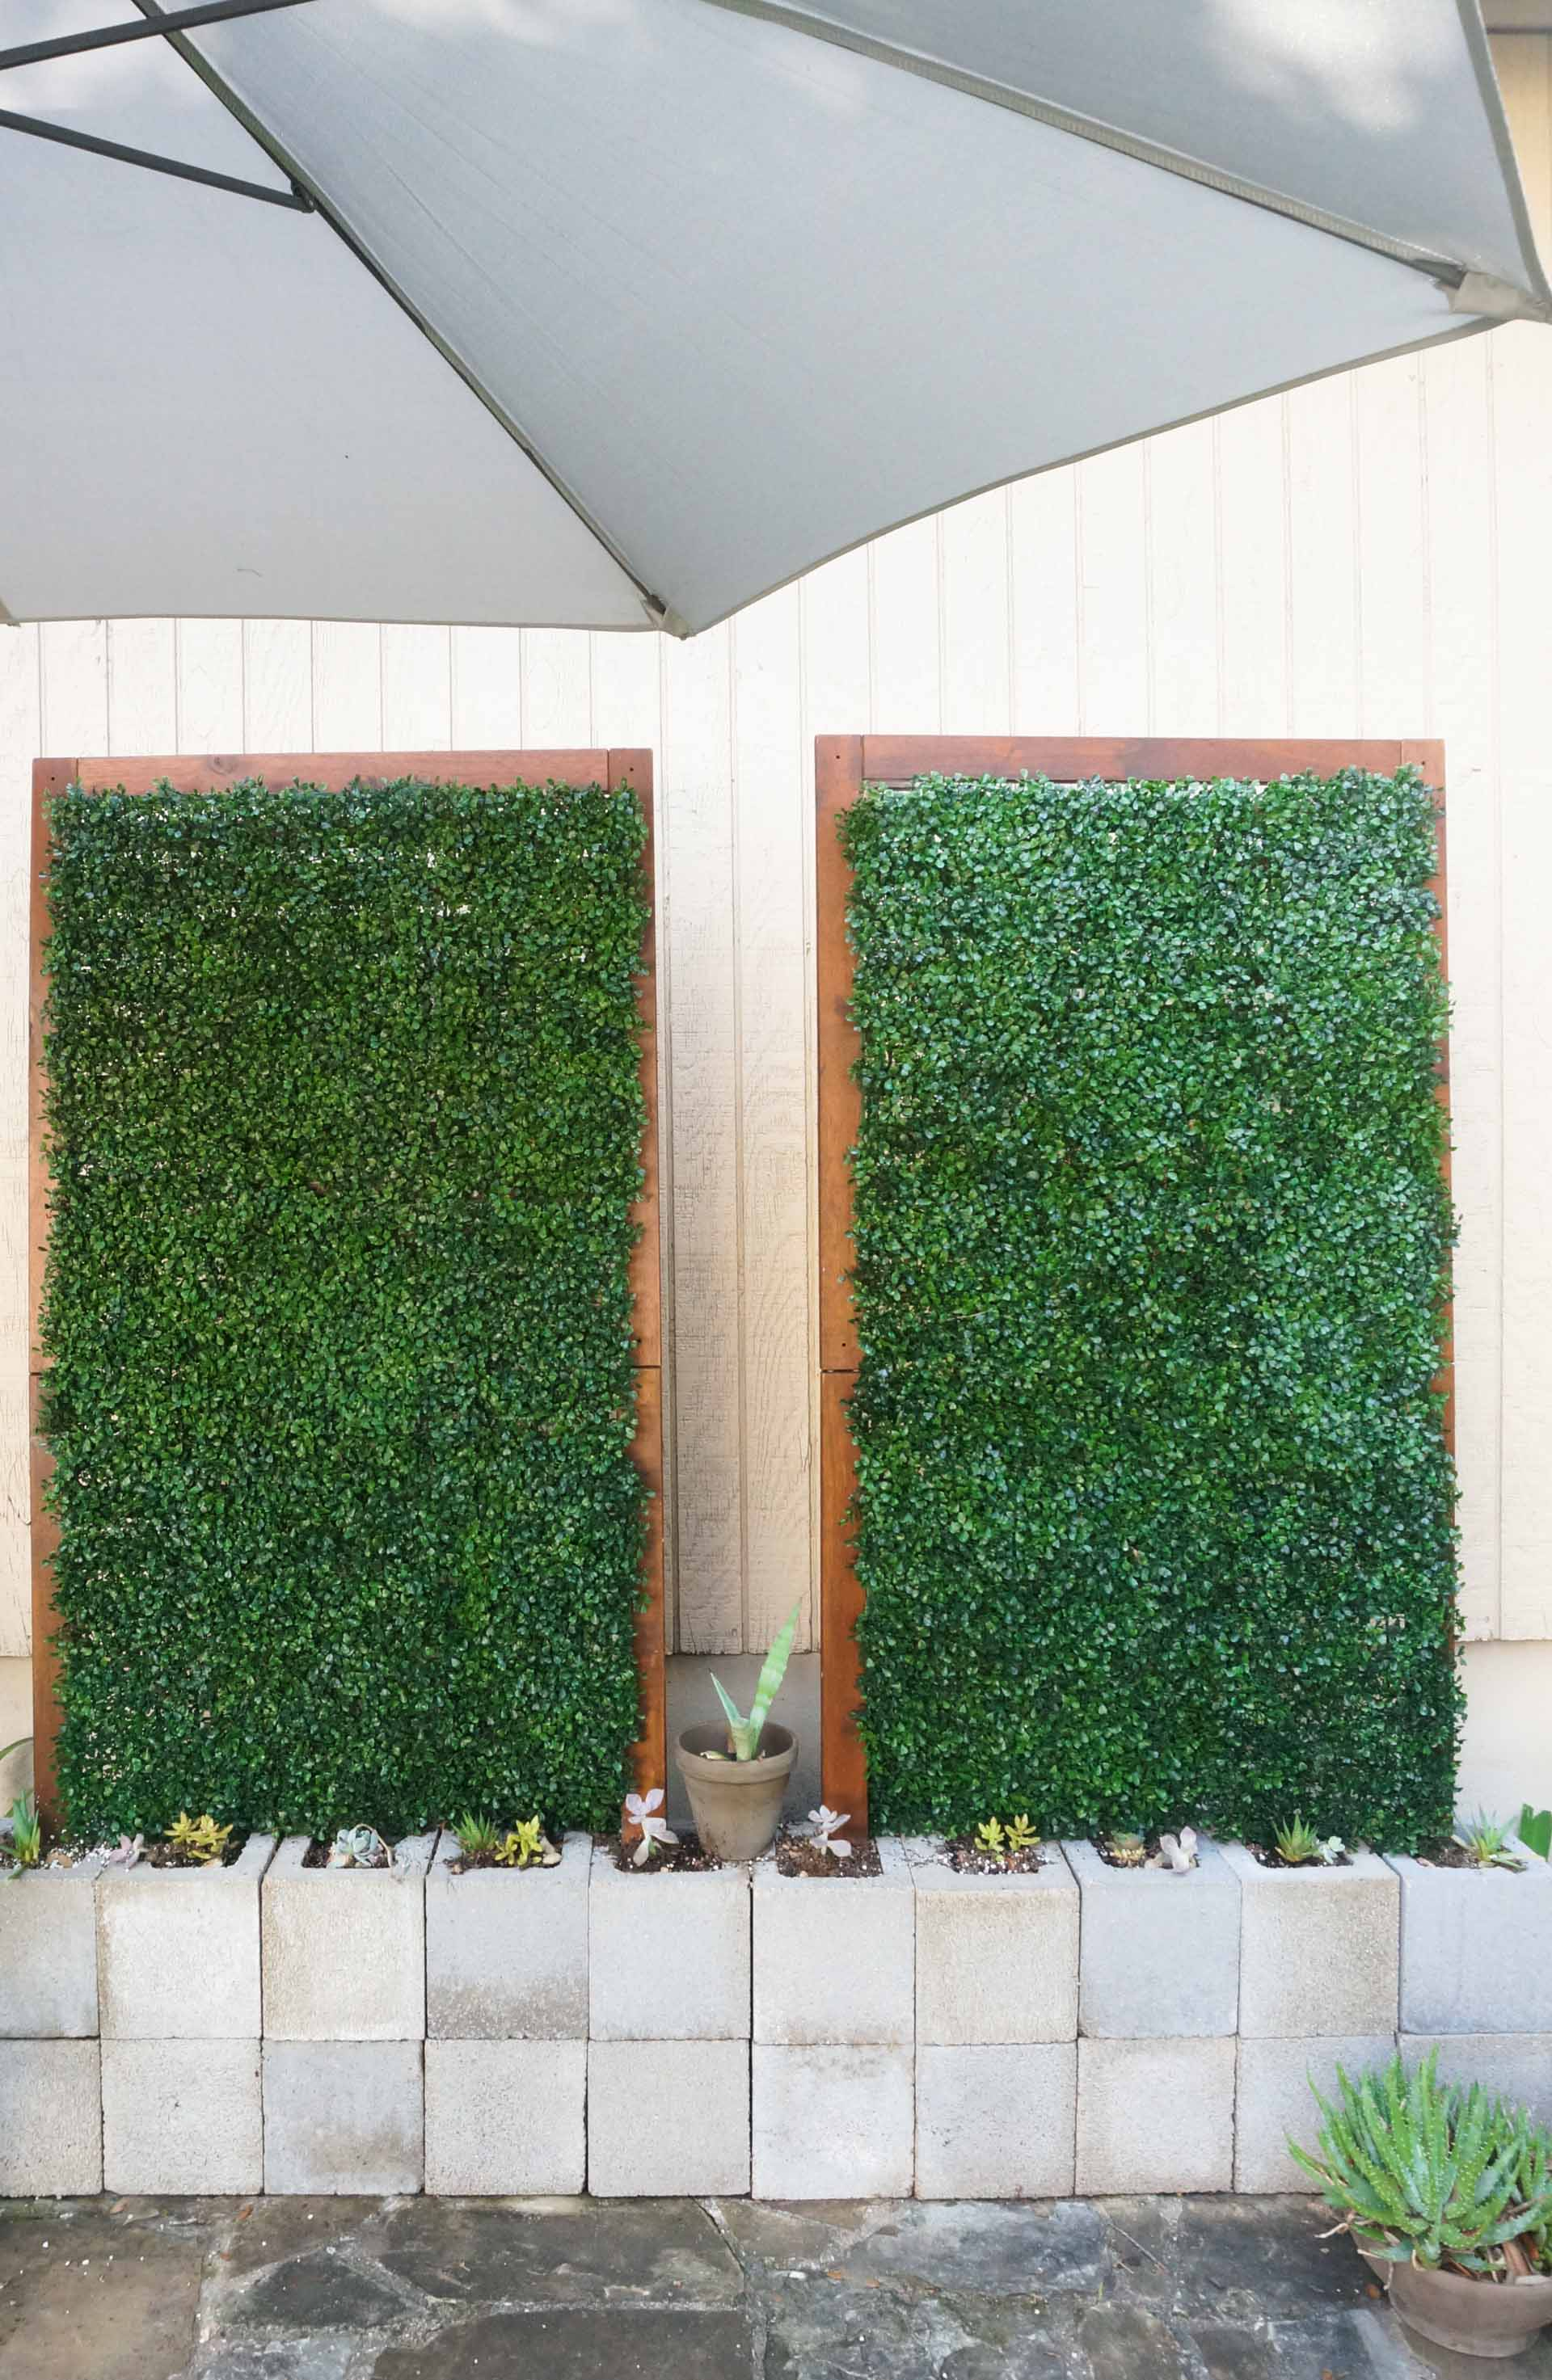 backyard decorating ideas on a budget - Backyard Decorating Ideas on a Budget